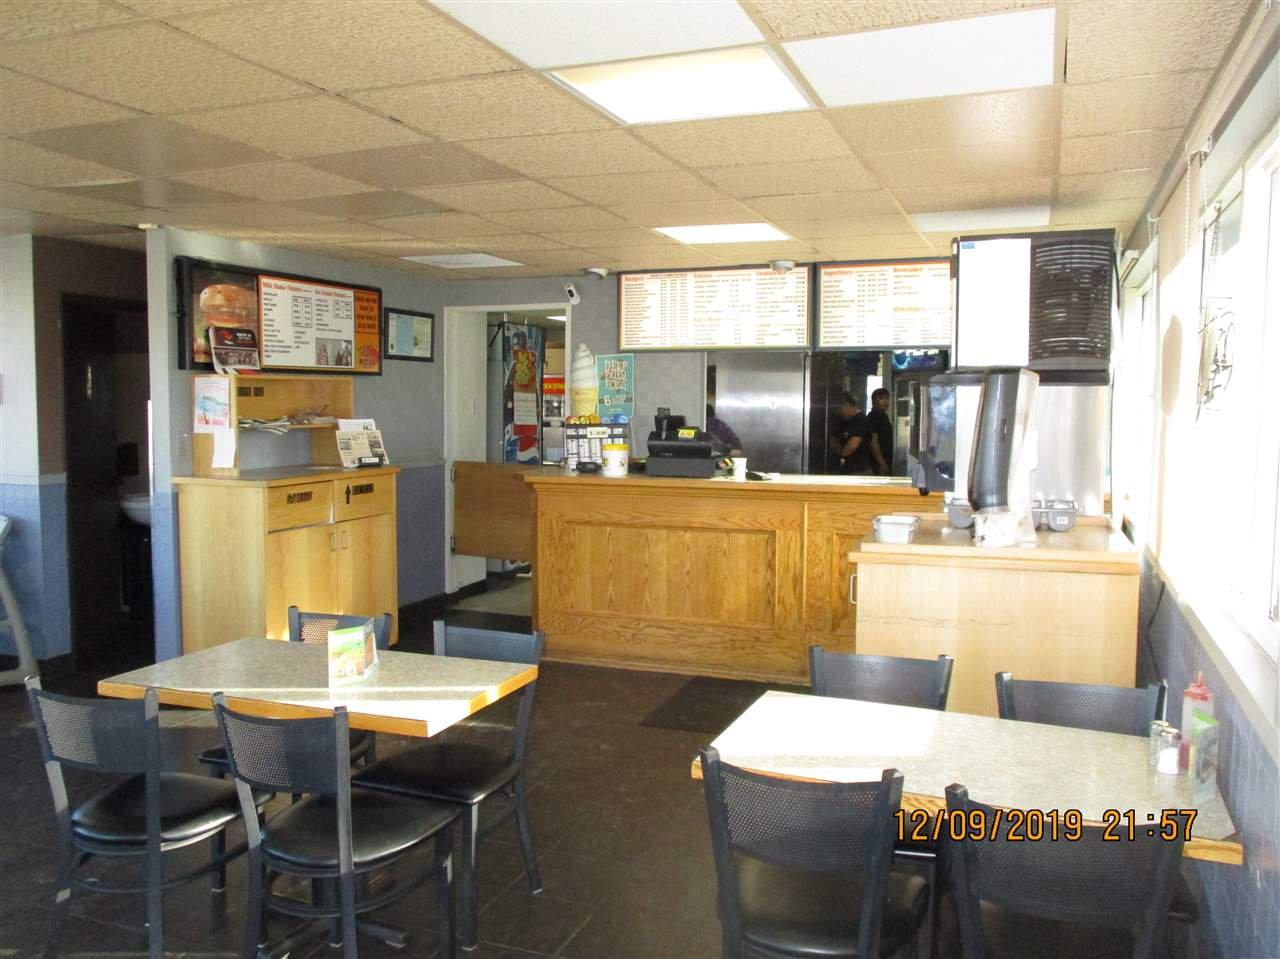 Main Photo: 5326 50 Avenue in Bonnyville Town: Bonnyville Business for sale : MLS®# E4174454